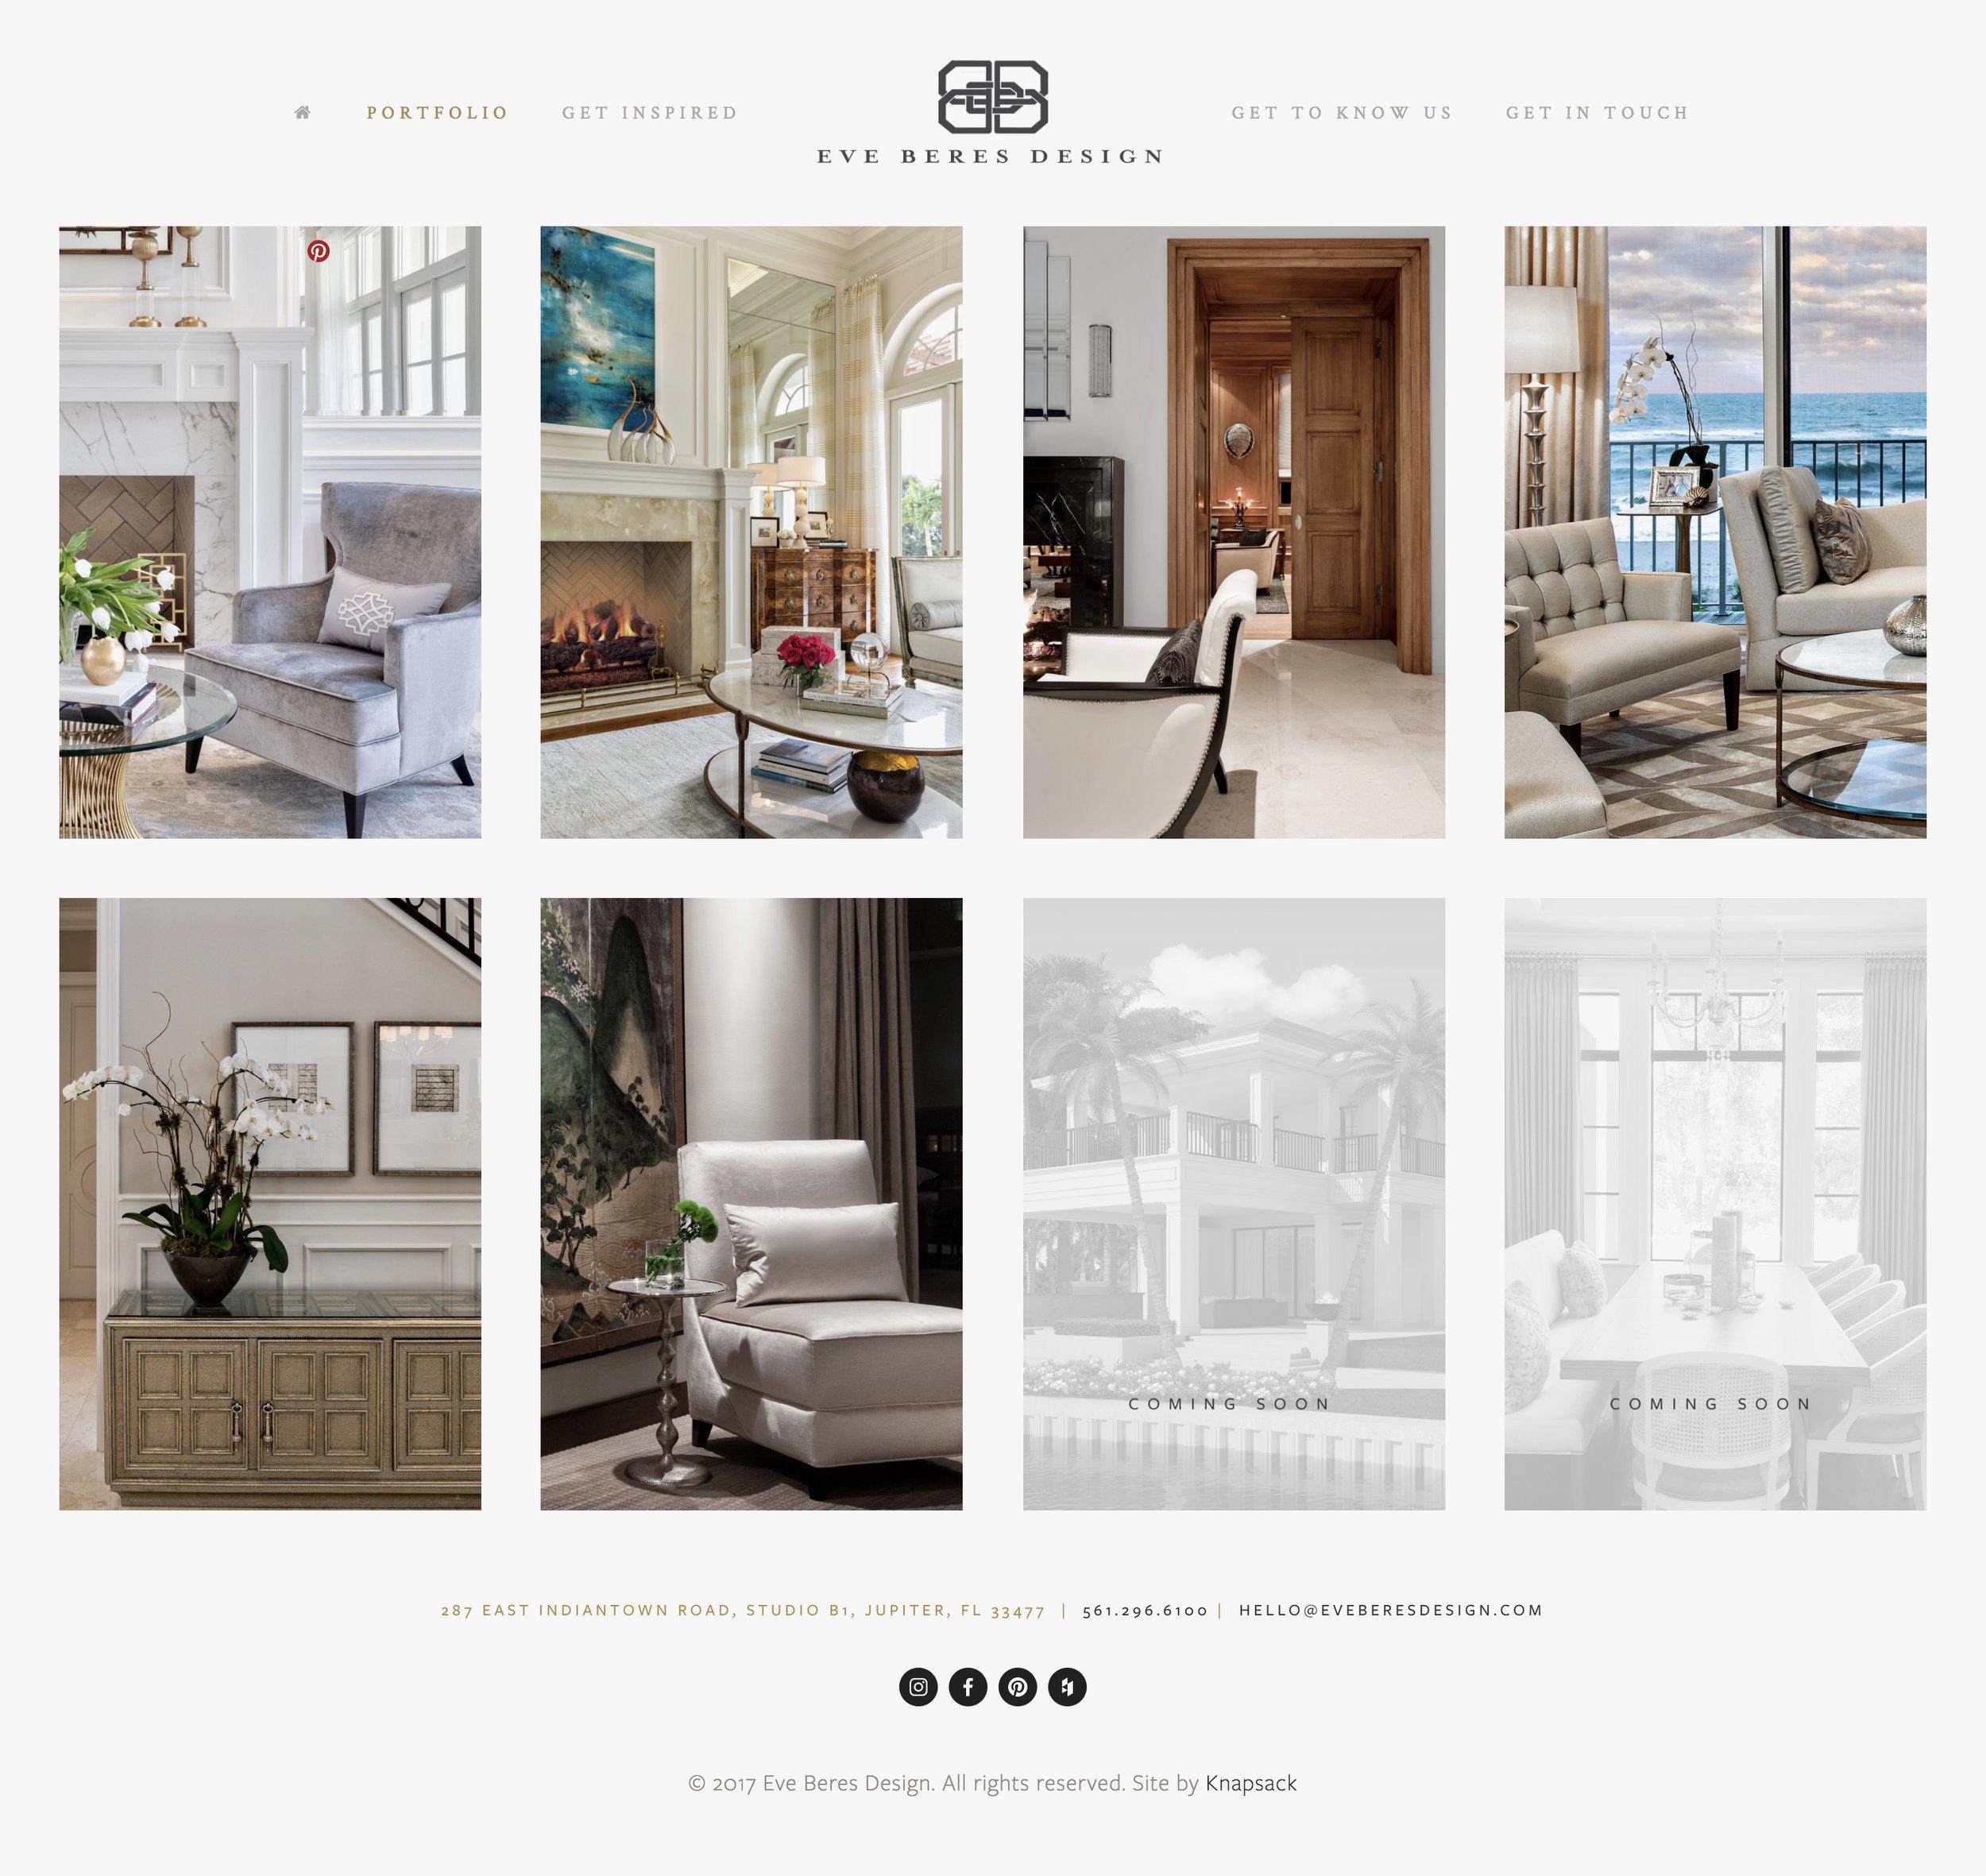 eve-beres-design-portfolio.jpg